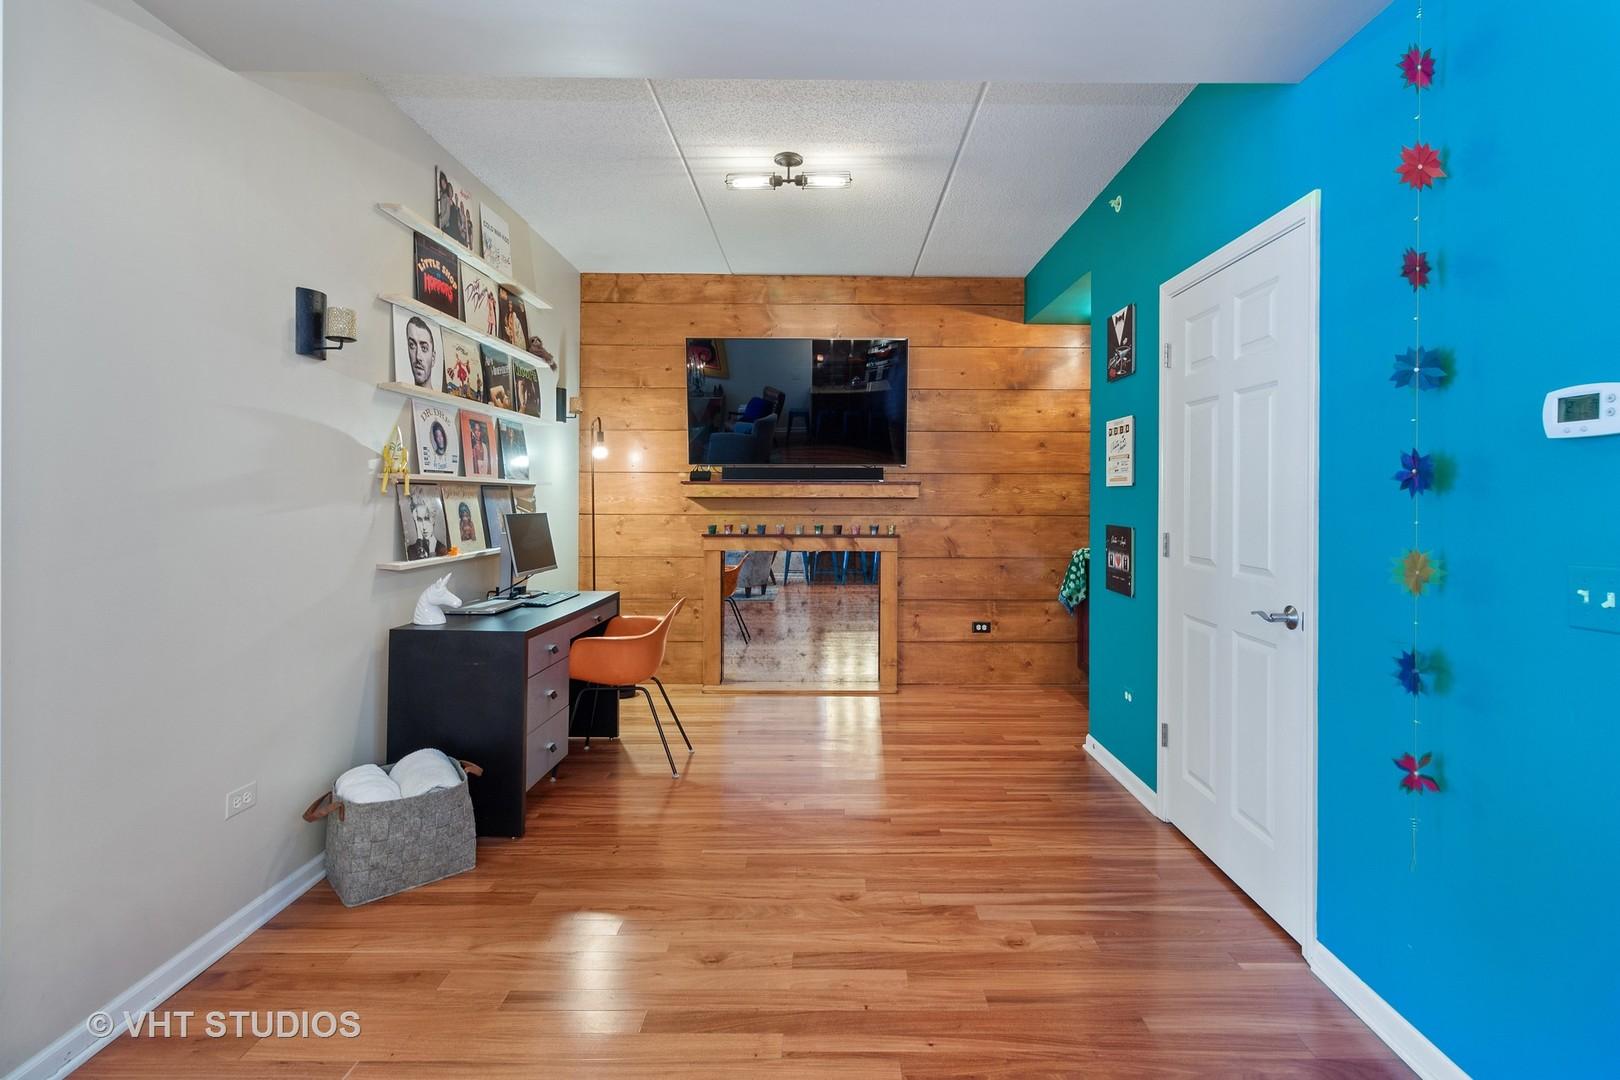 435 Wood Unit Unit 210a ,Palatine, Illinois 60067